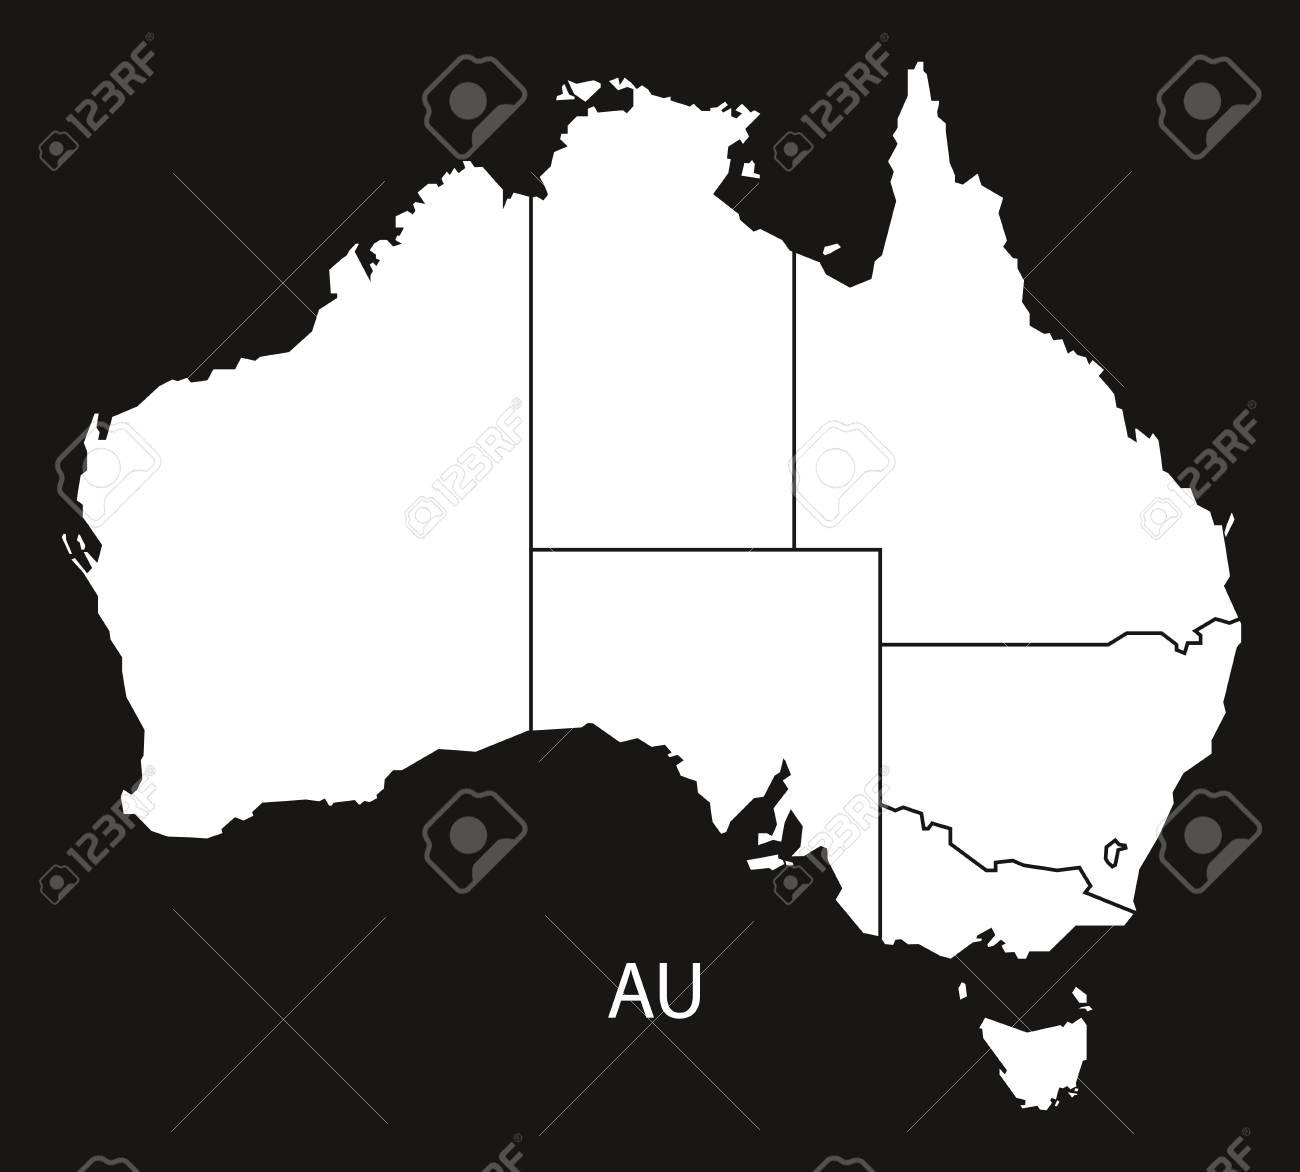 Australia Map Black And White.Australia Map With States Black White